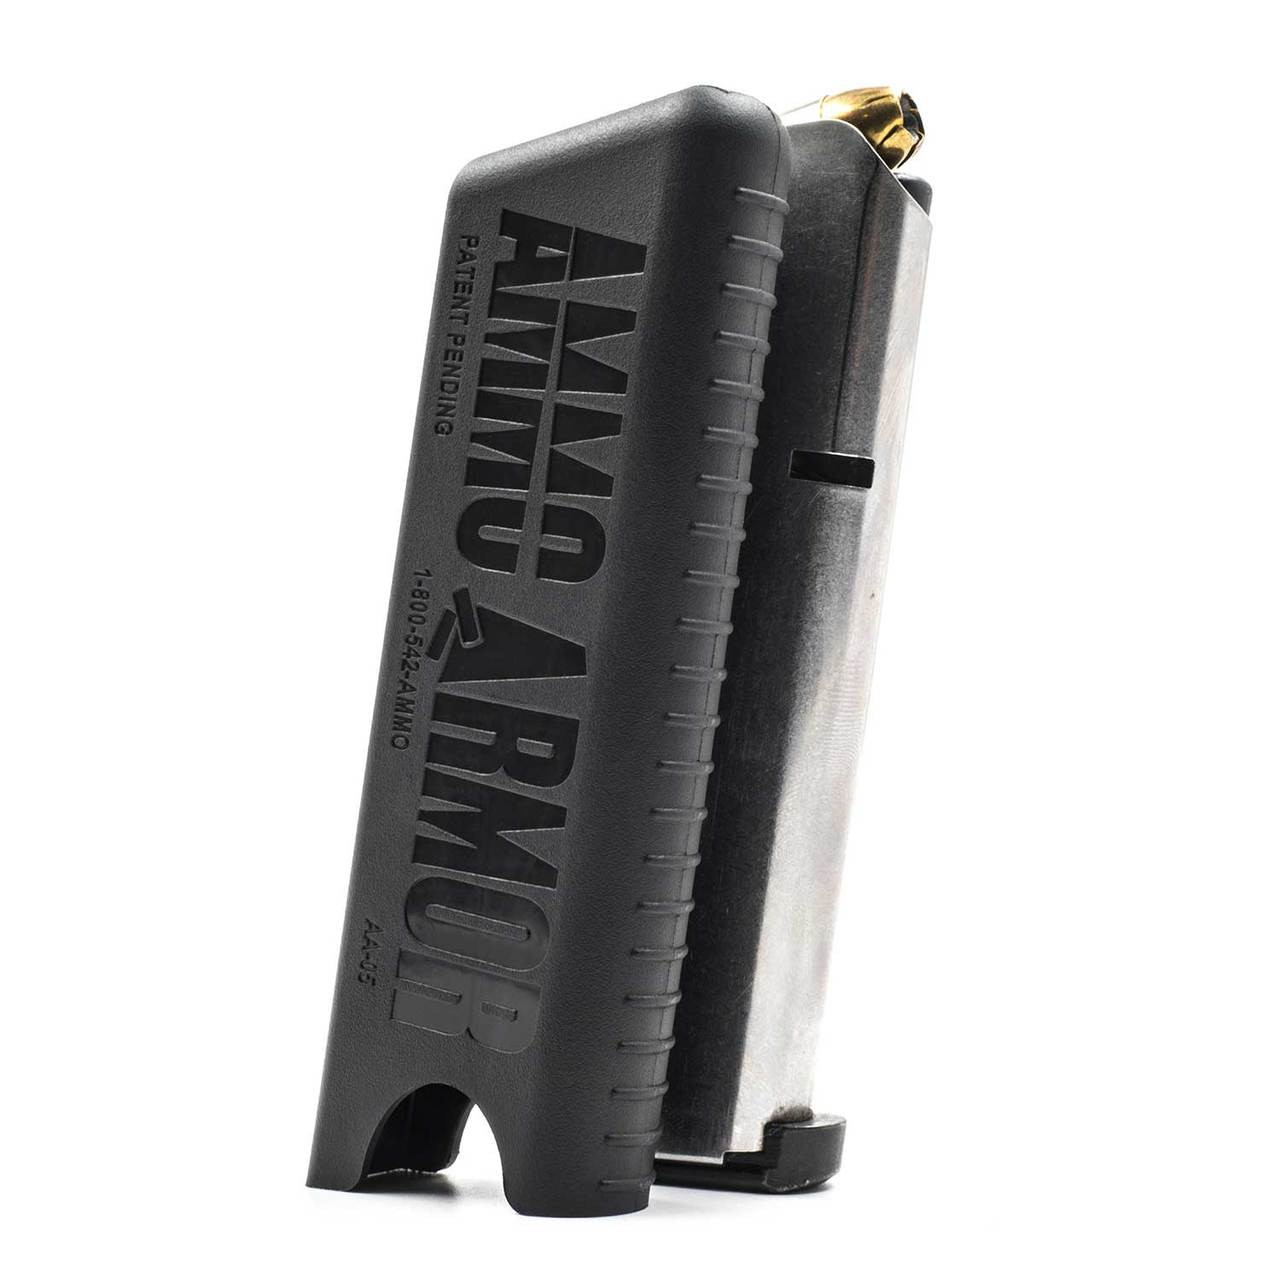 Dan Wesson Valkyrie (.45) Ammo Armor